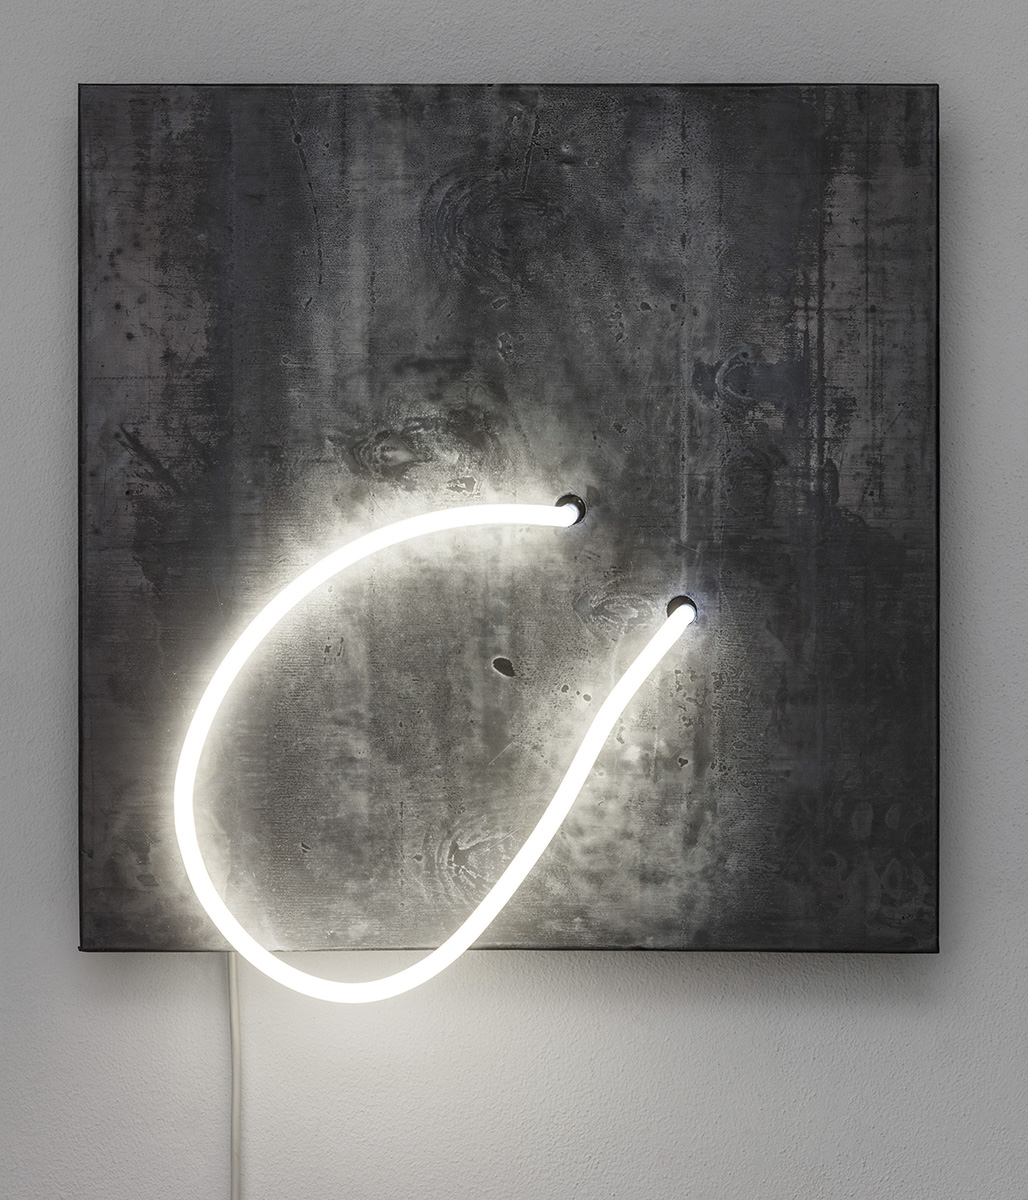 Balloni, 2017 45 x 45 x 12 cm Neon light, wood and lead